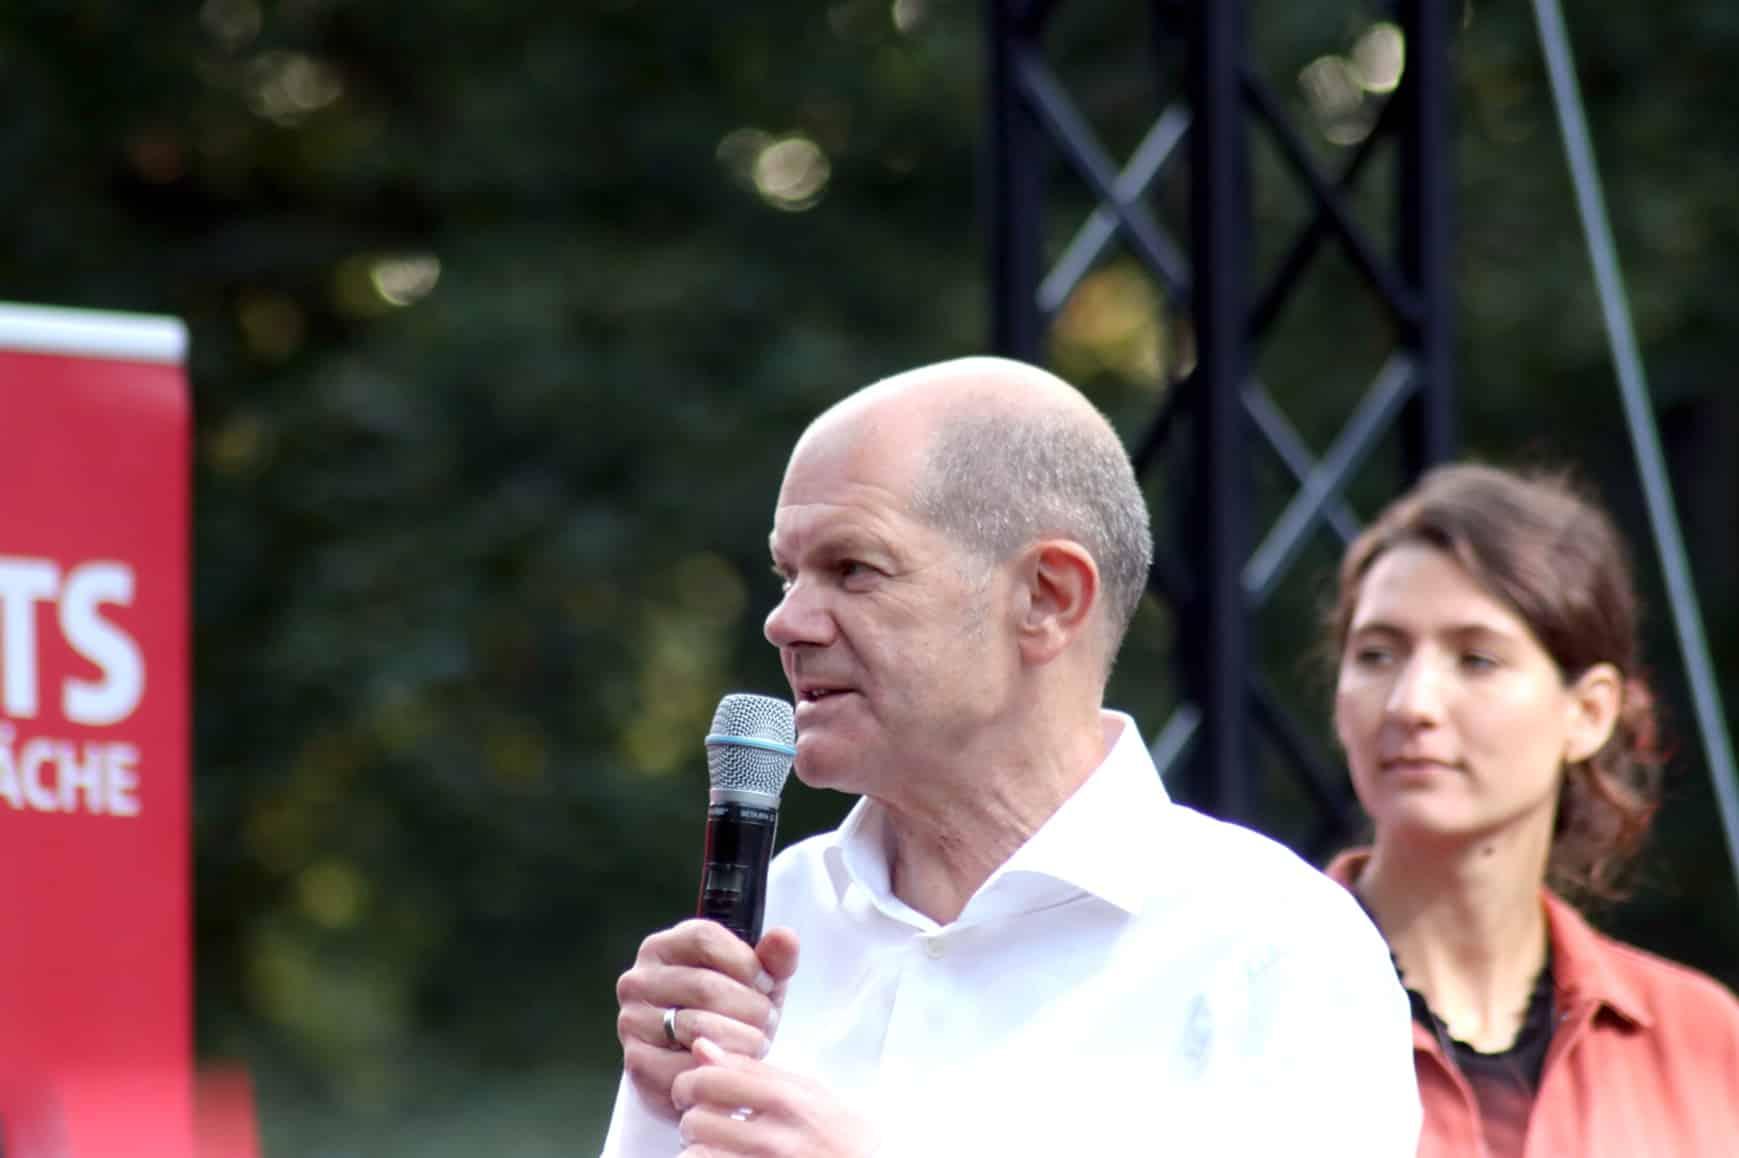 Olaf Scholz beim Wahlkampf in Leipzig (Clarapark). Foto: LZ